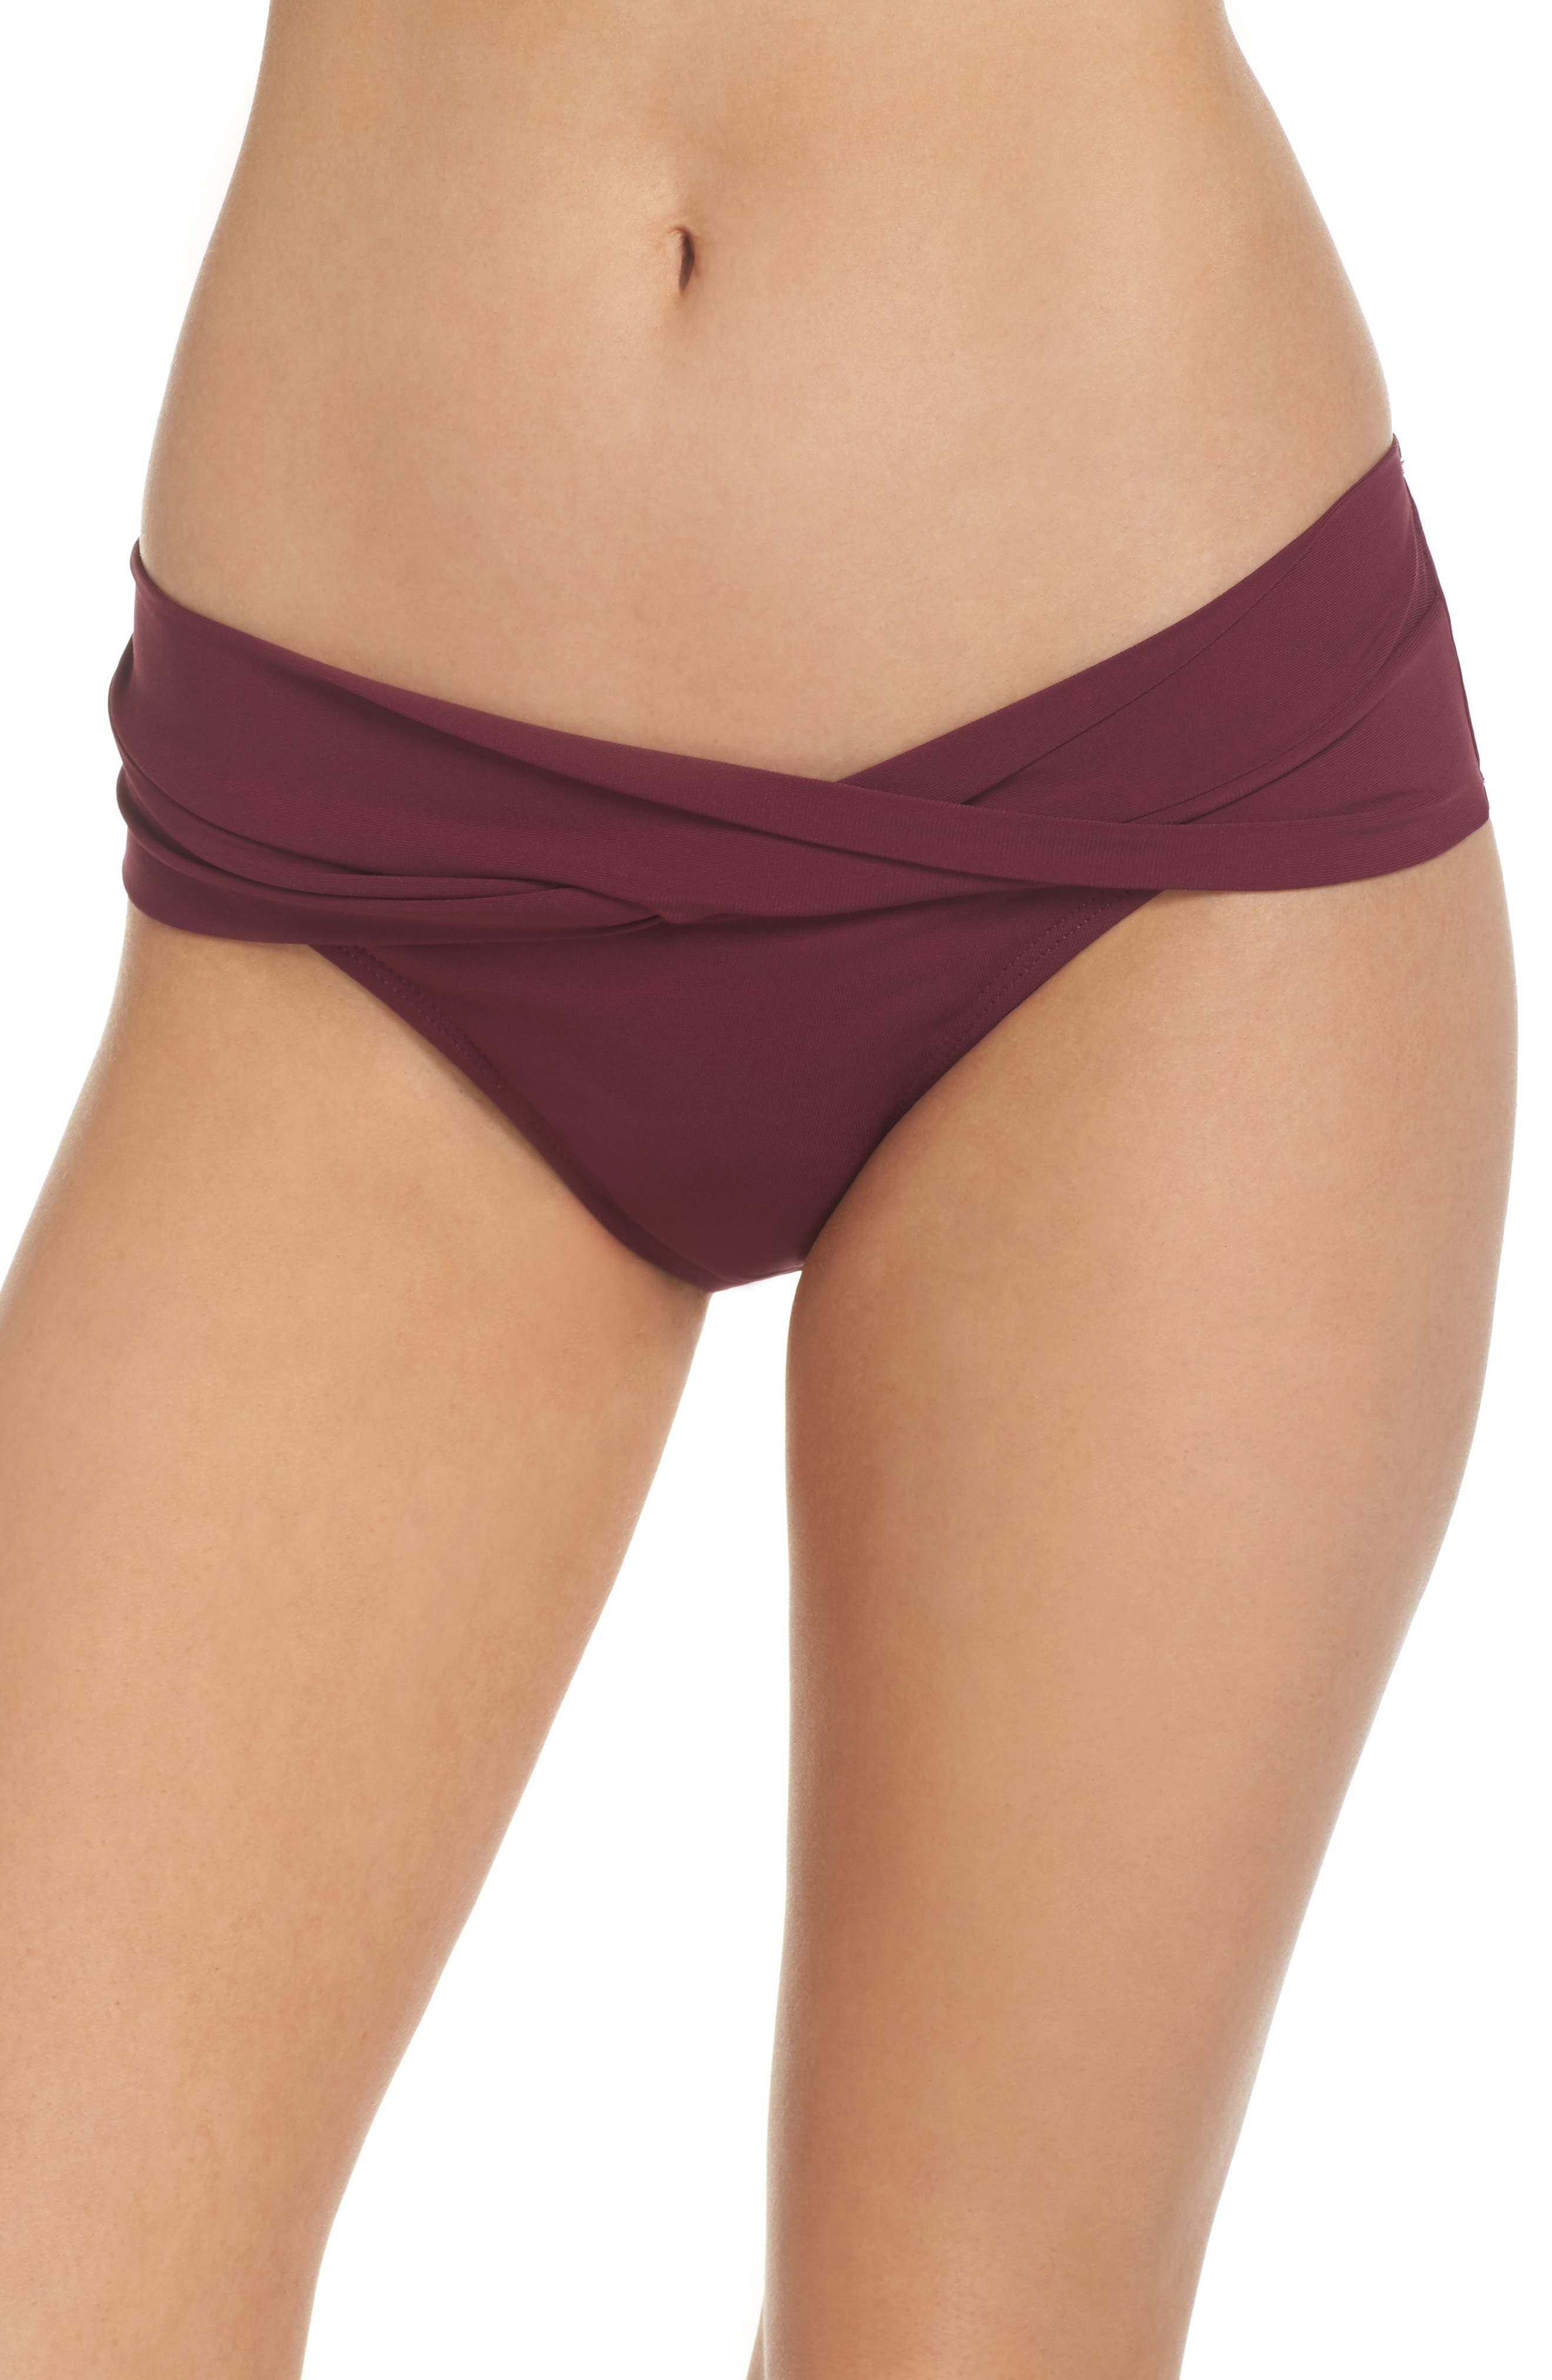 Ava Twist Hipster Bikini Bottoms,                         Main,                         color, Rubine